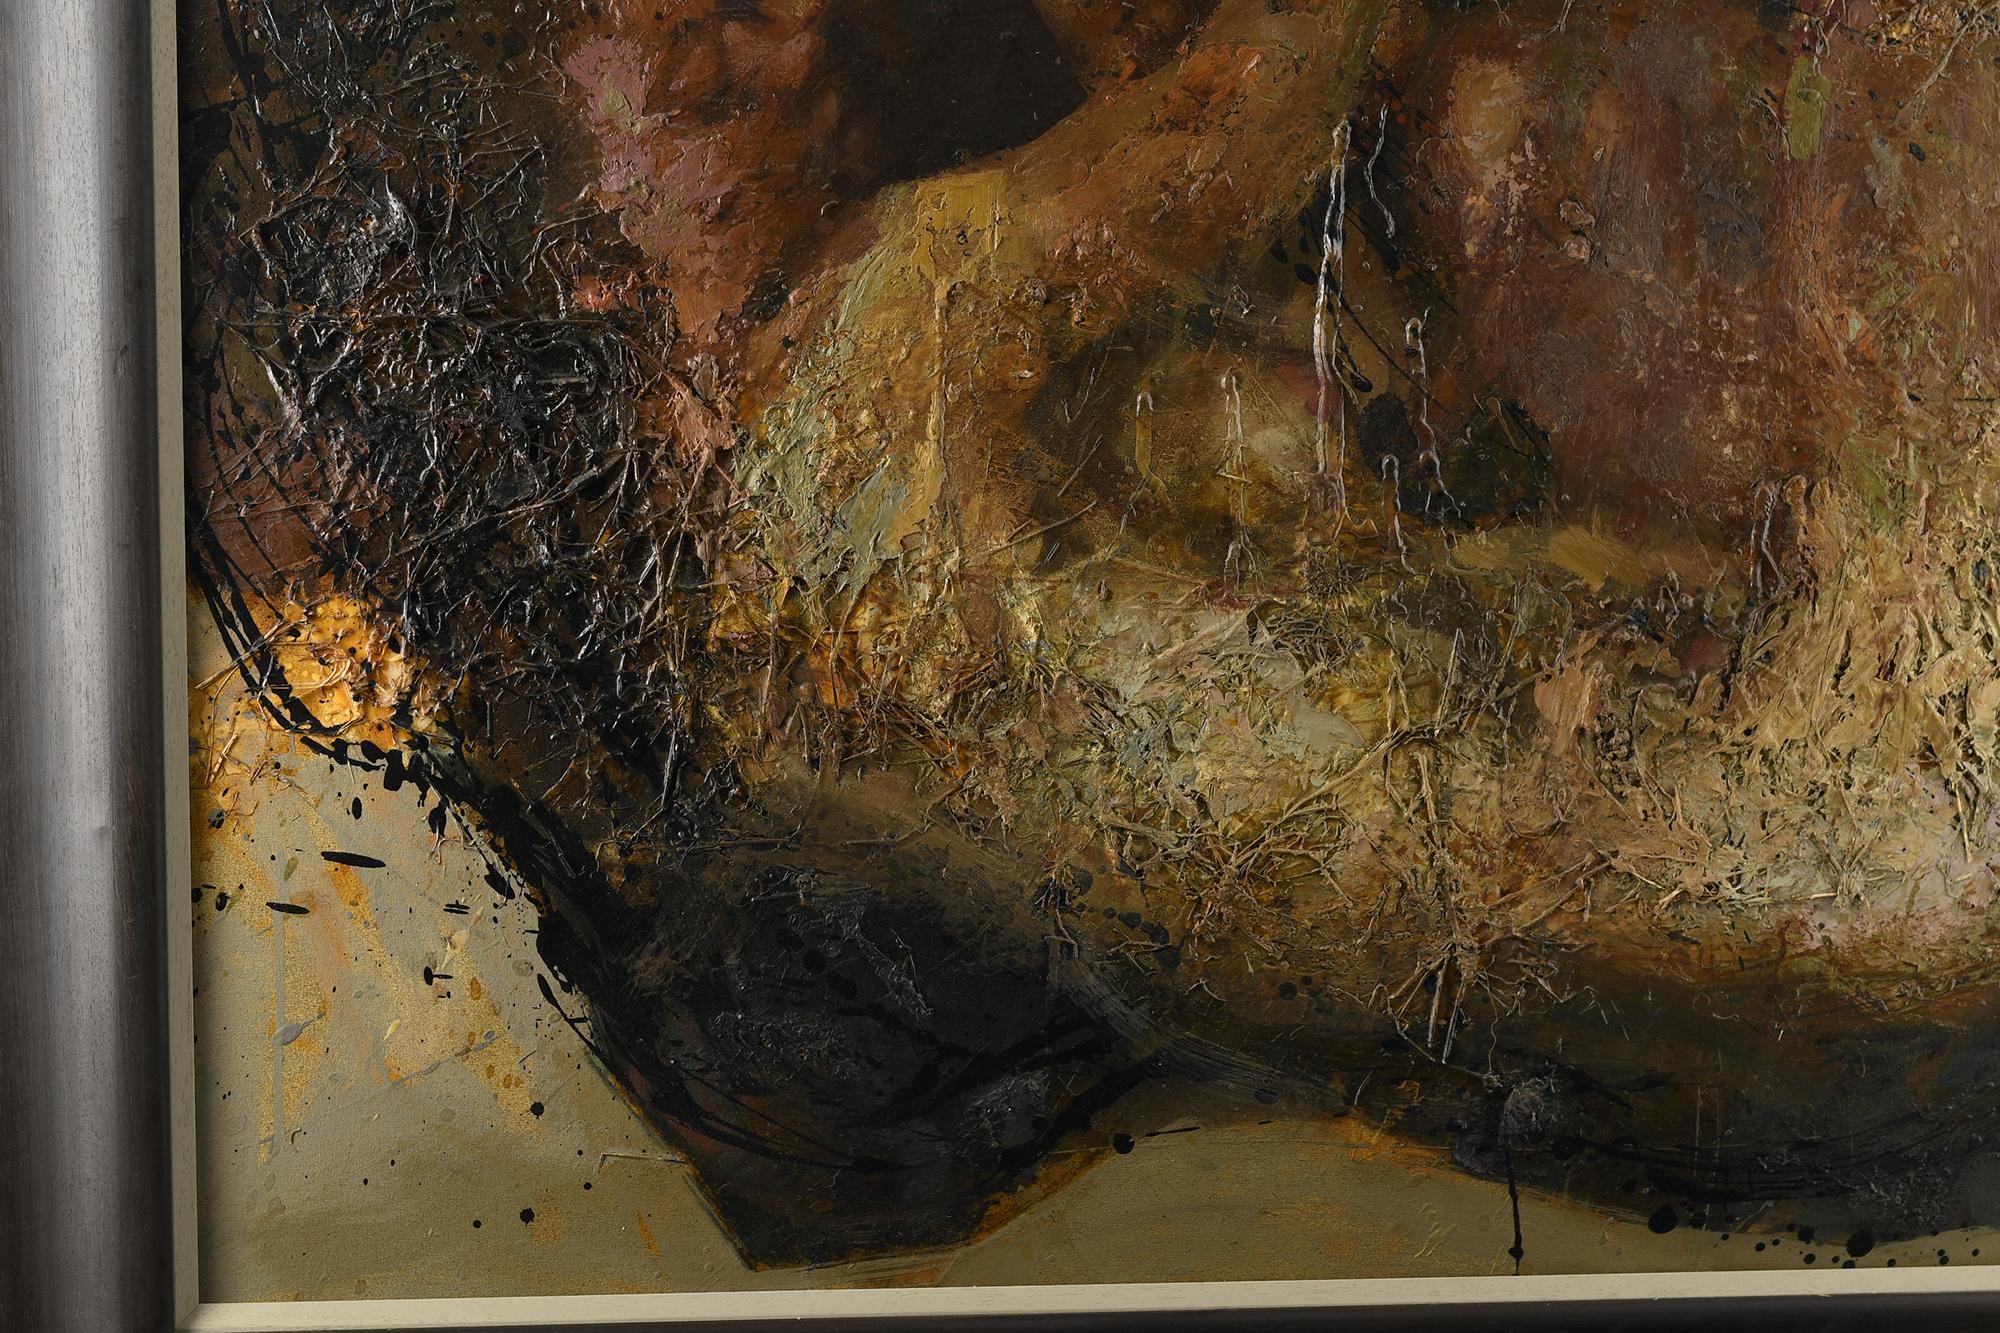 Stunning Original Painting by Renowned Scottish artist Alan McGowan. - Image 13 of 22